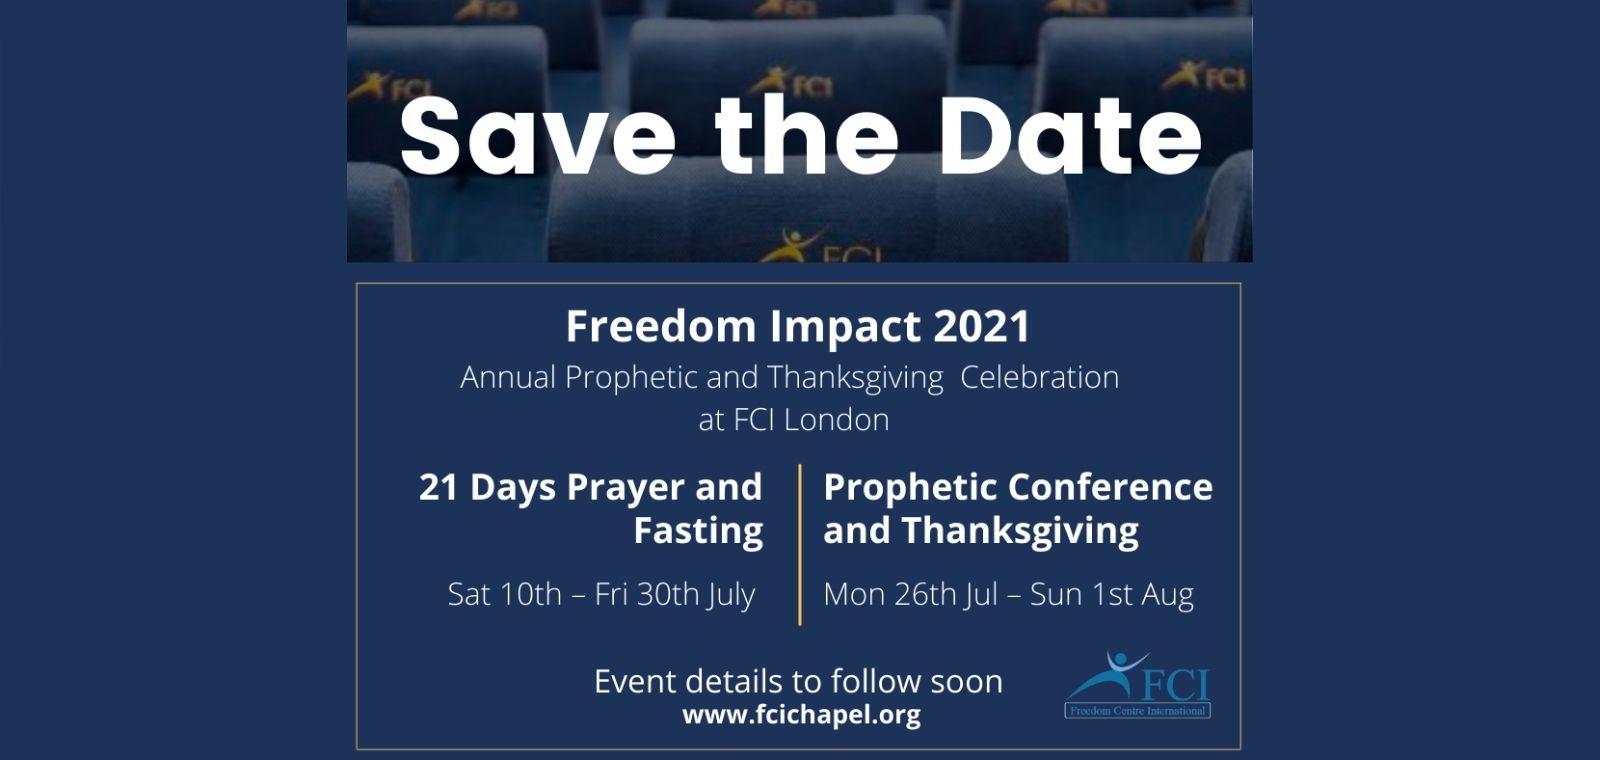 FCI - Freedom Impact 2021